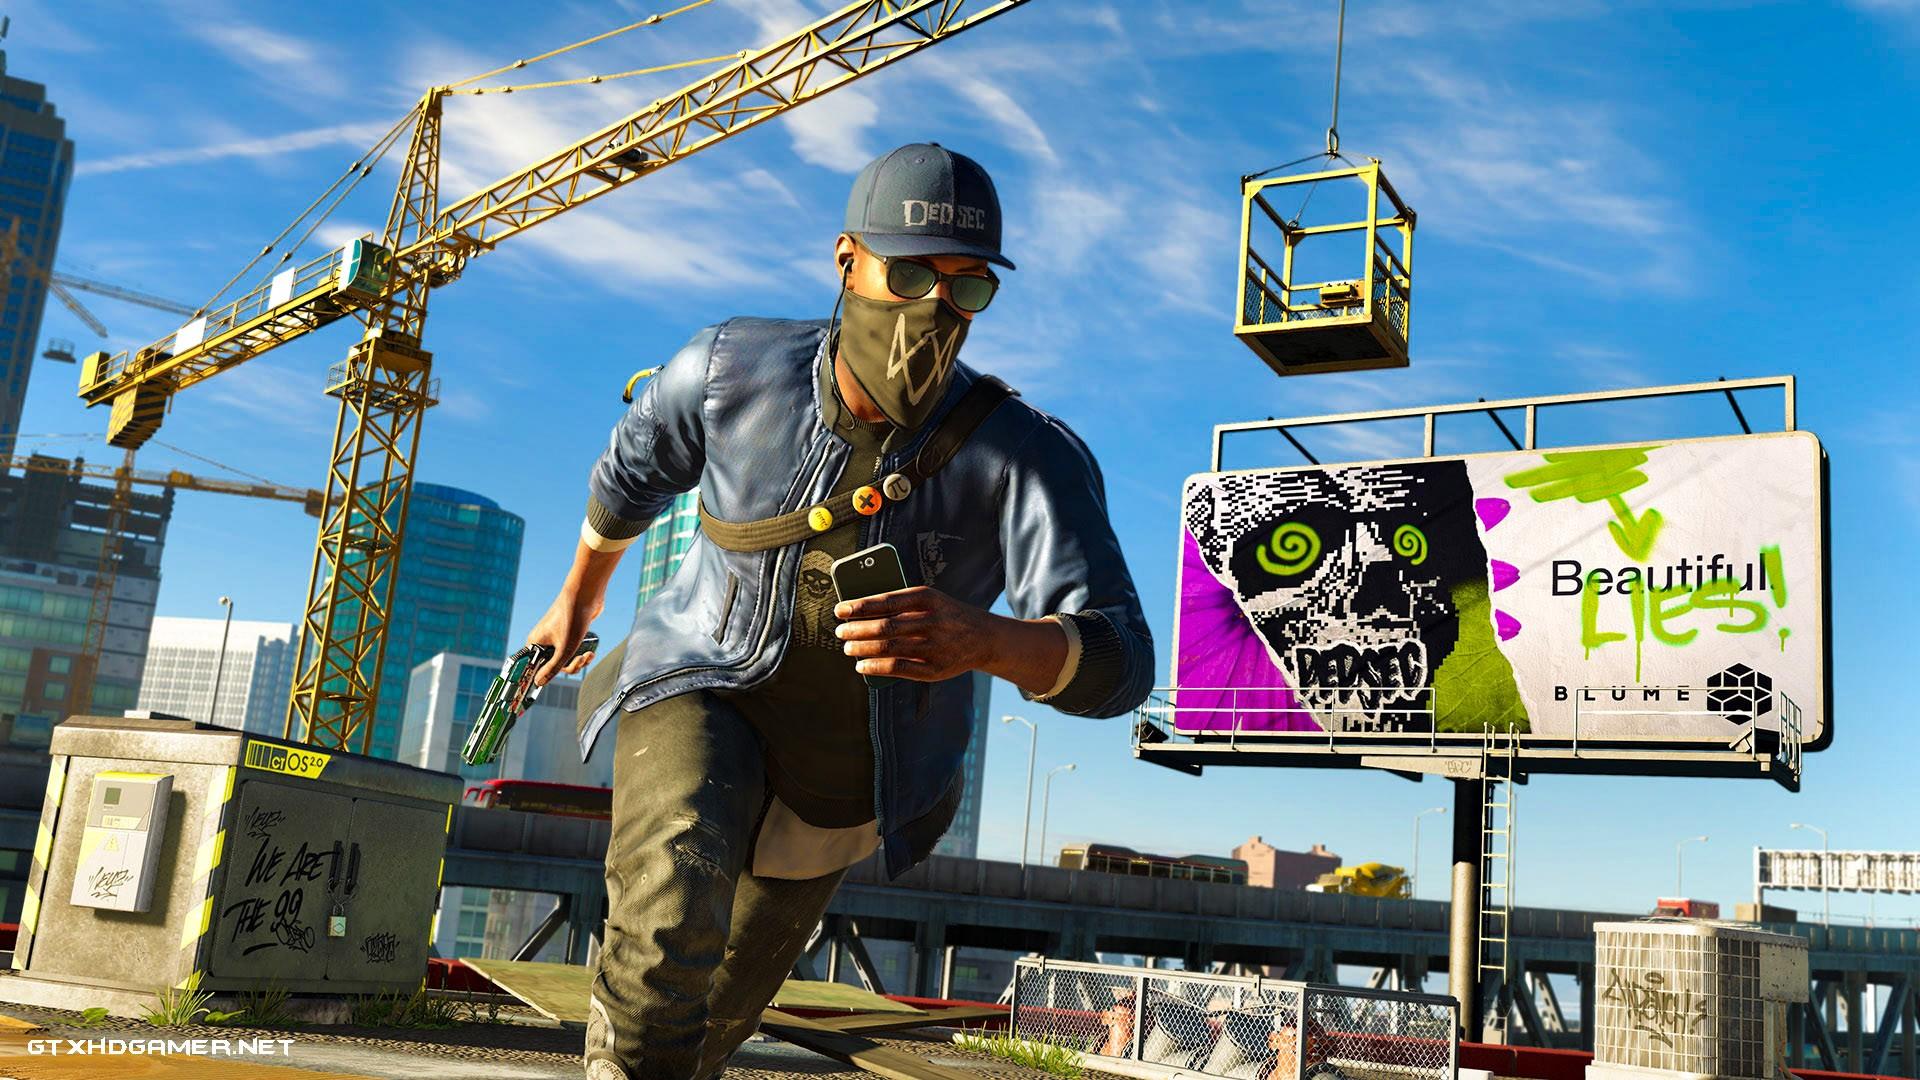 General 1920x1080 Upcoming Games Watch_Dogs 2 hackers cranes (machine) billboards